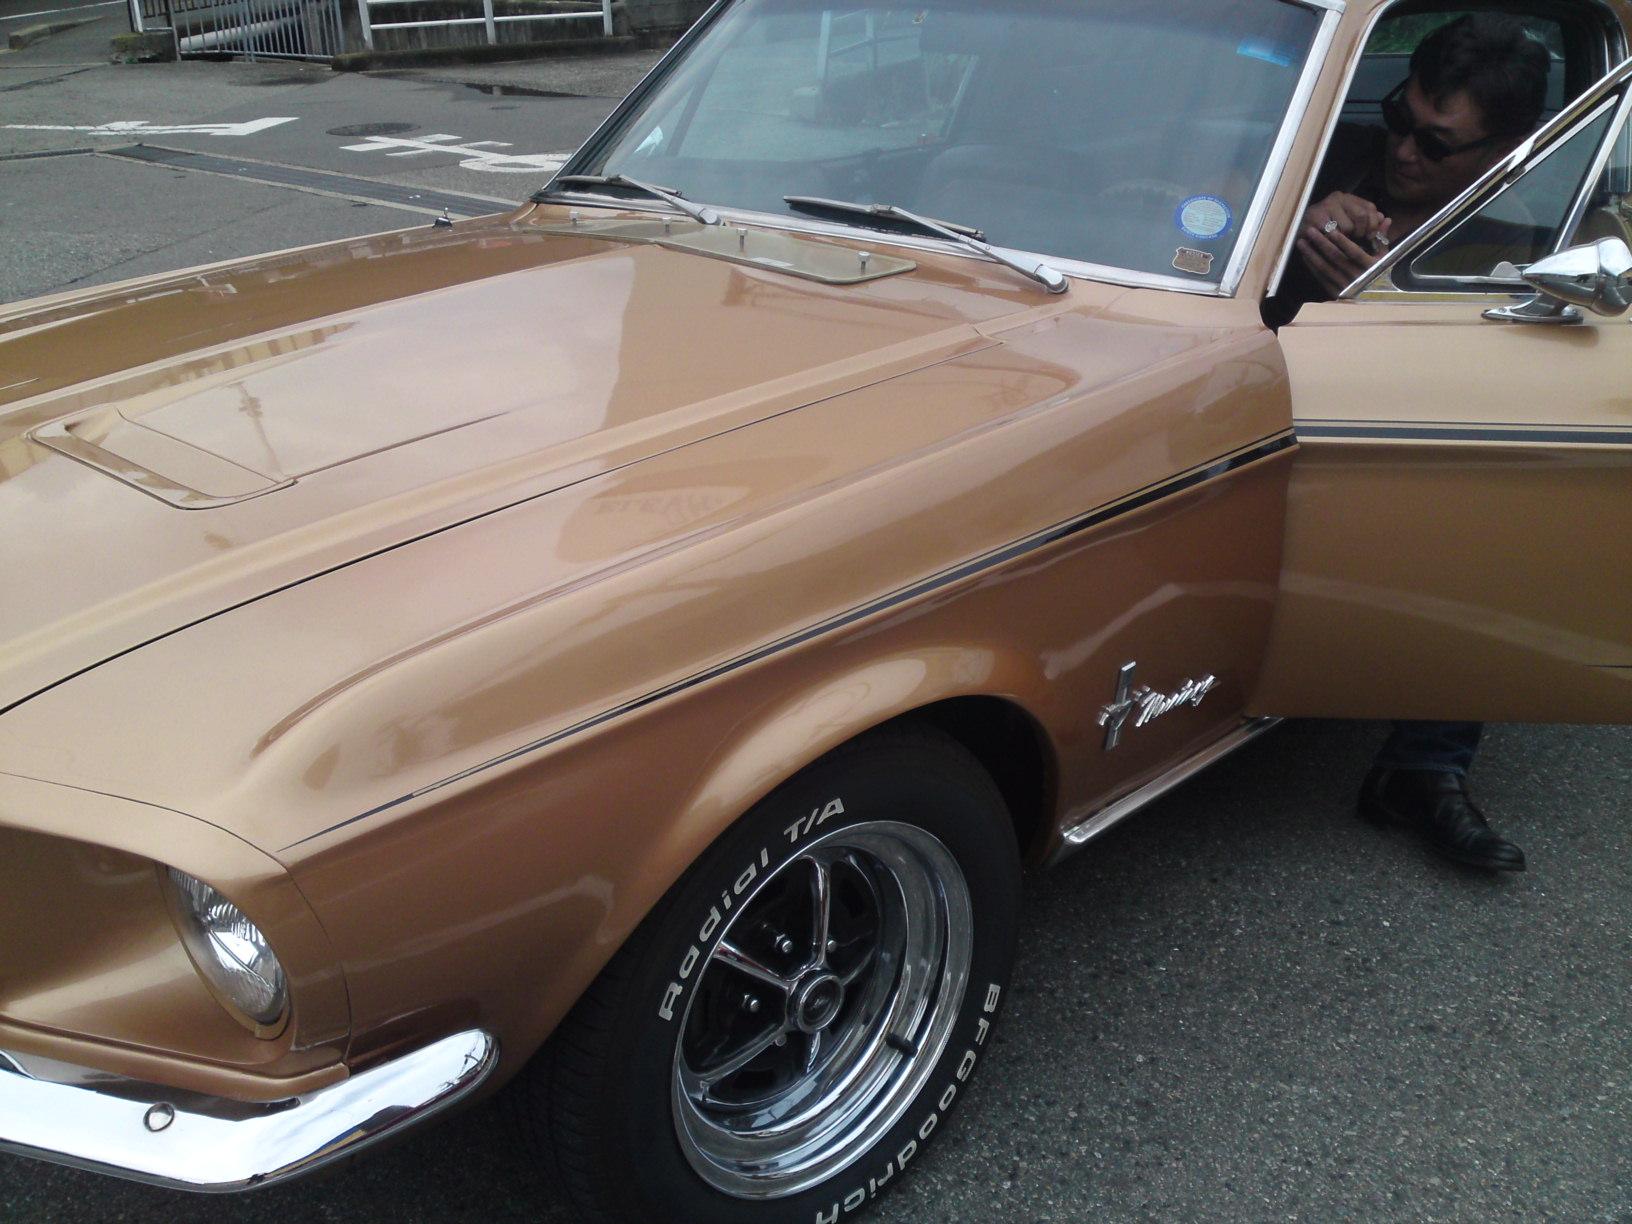 '68 Mustang_b0153544_10414770.jpg